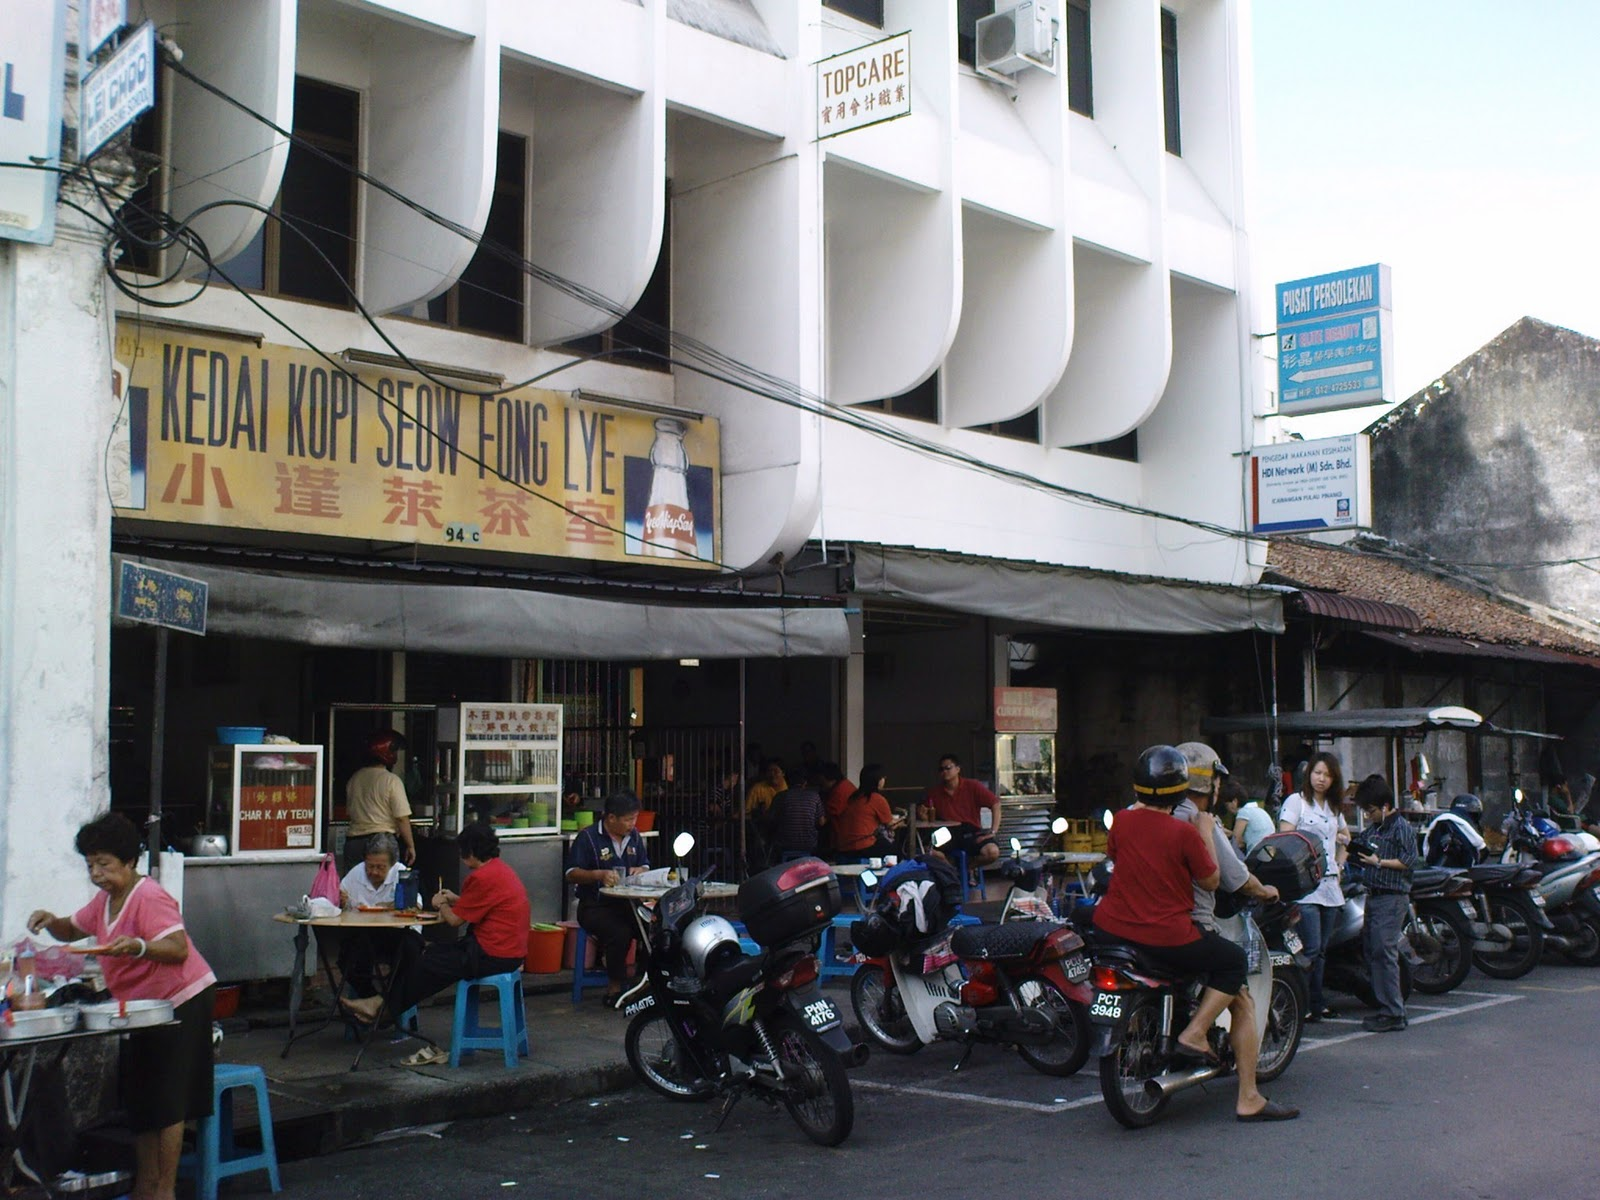 Eat Out With Sam Cheap Good Morning Breakfast Kedai Kopi Seow Fong Lye Penang